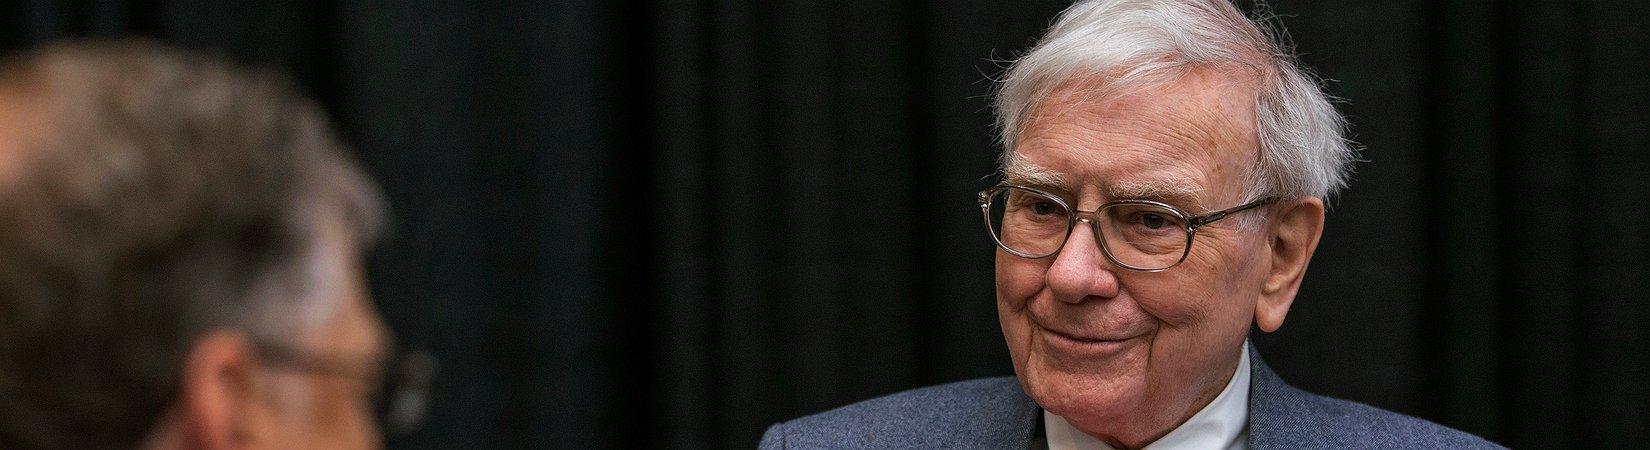 Warren Buffett lifts exposure to airlines, dumps 21st Century Fox